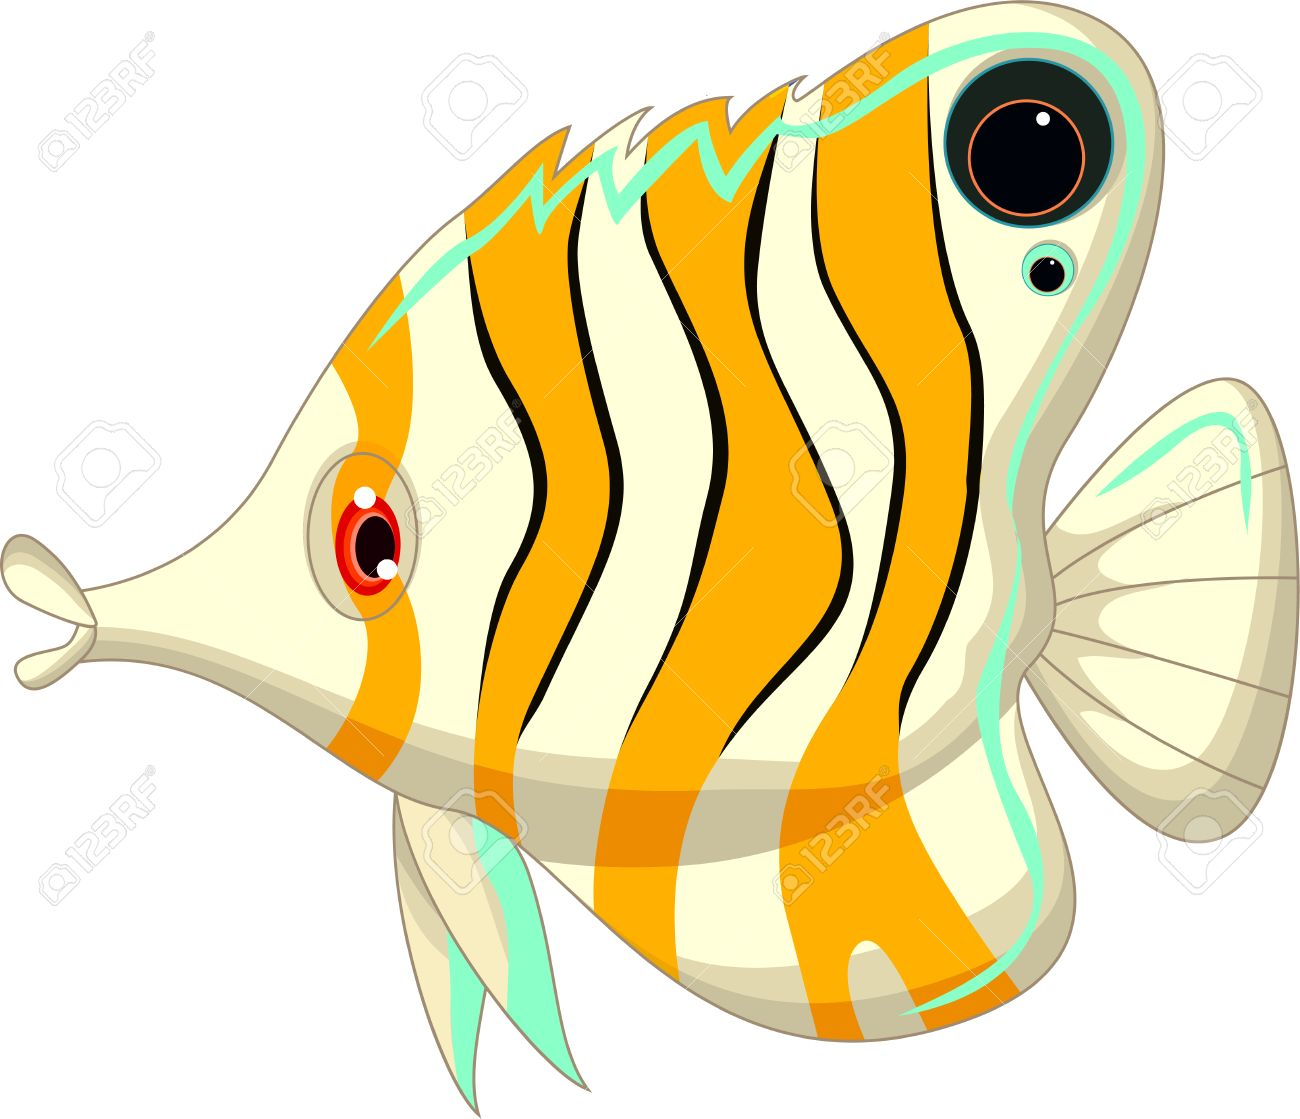 Uncategorized Cartoon Angel Fish cute cartoon angel fish royalty free cliparts vectors and stock vector 38015210